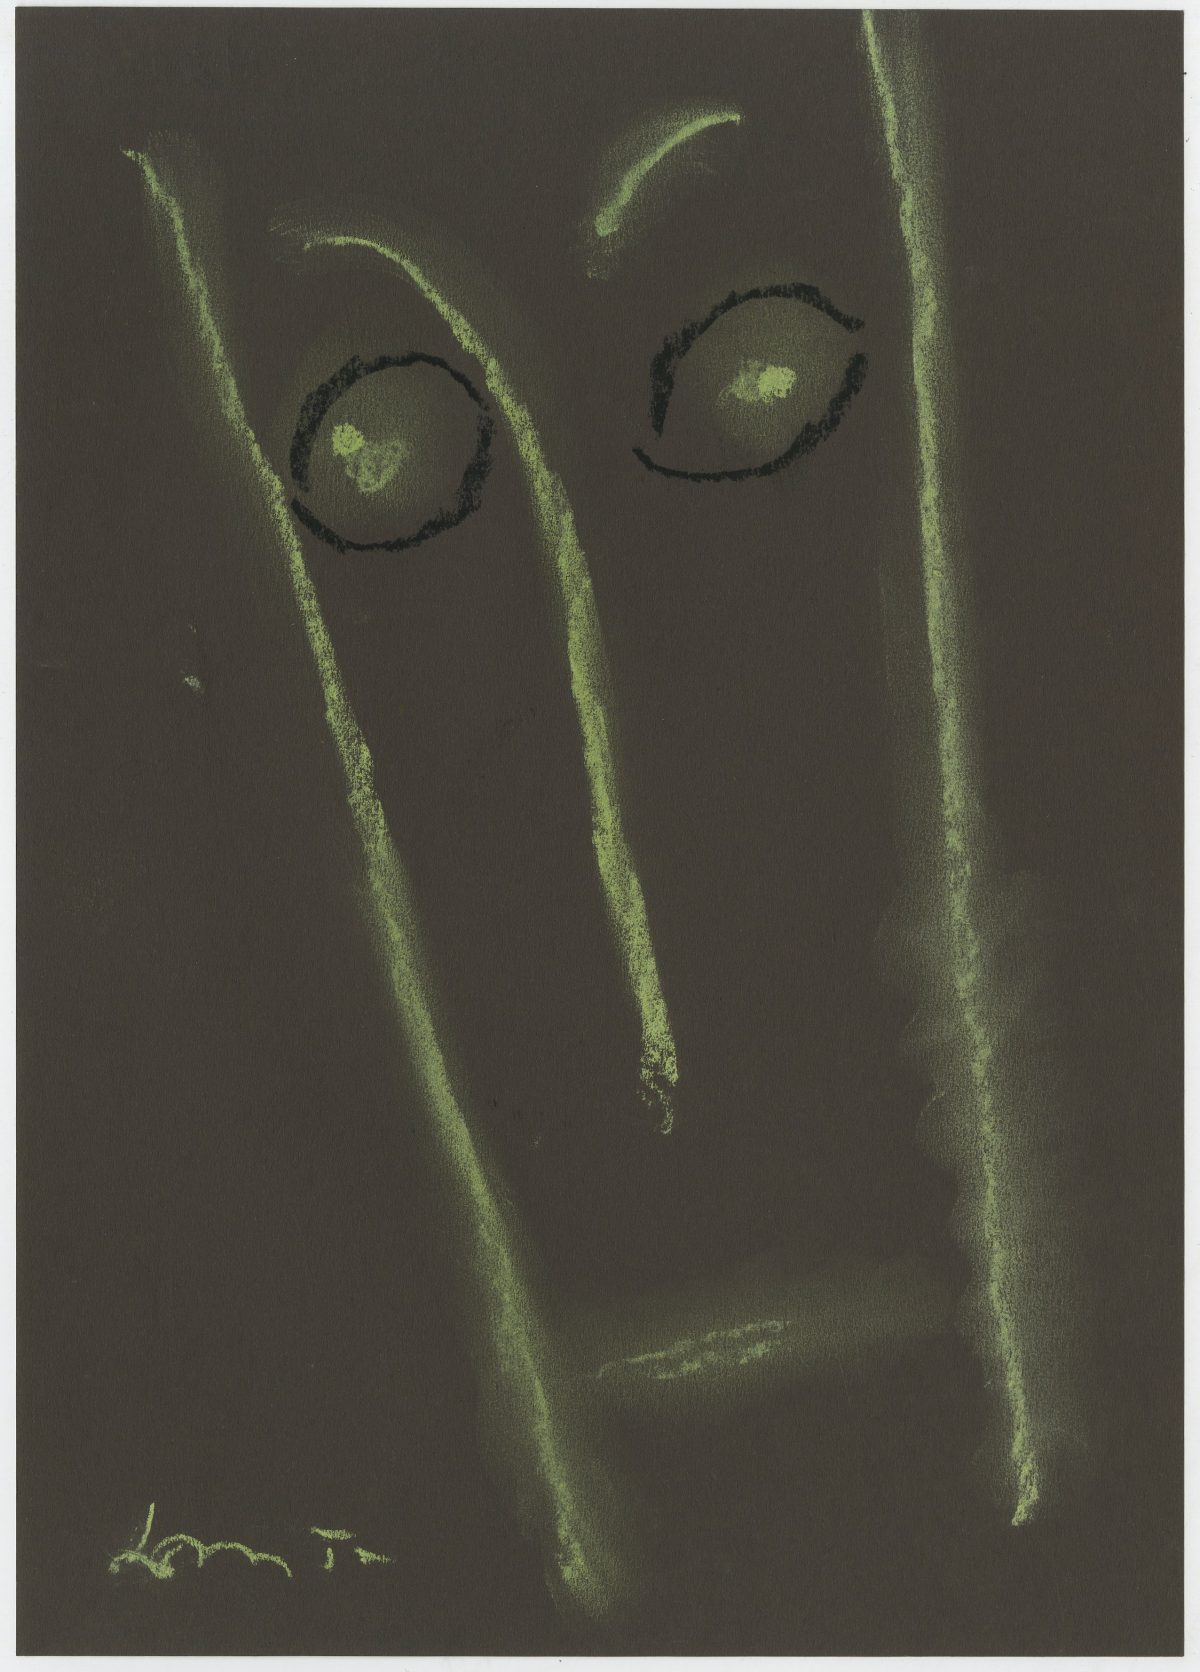 G13186(78)<br/> <b>Cím:</b> Fűbe harapók <br/> <b>Méret cm:</b> 29,6X21 <br/> <b>Készült:</b> 2005. <br/> <b>Technika:</b> pittkréta<br/>